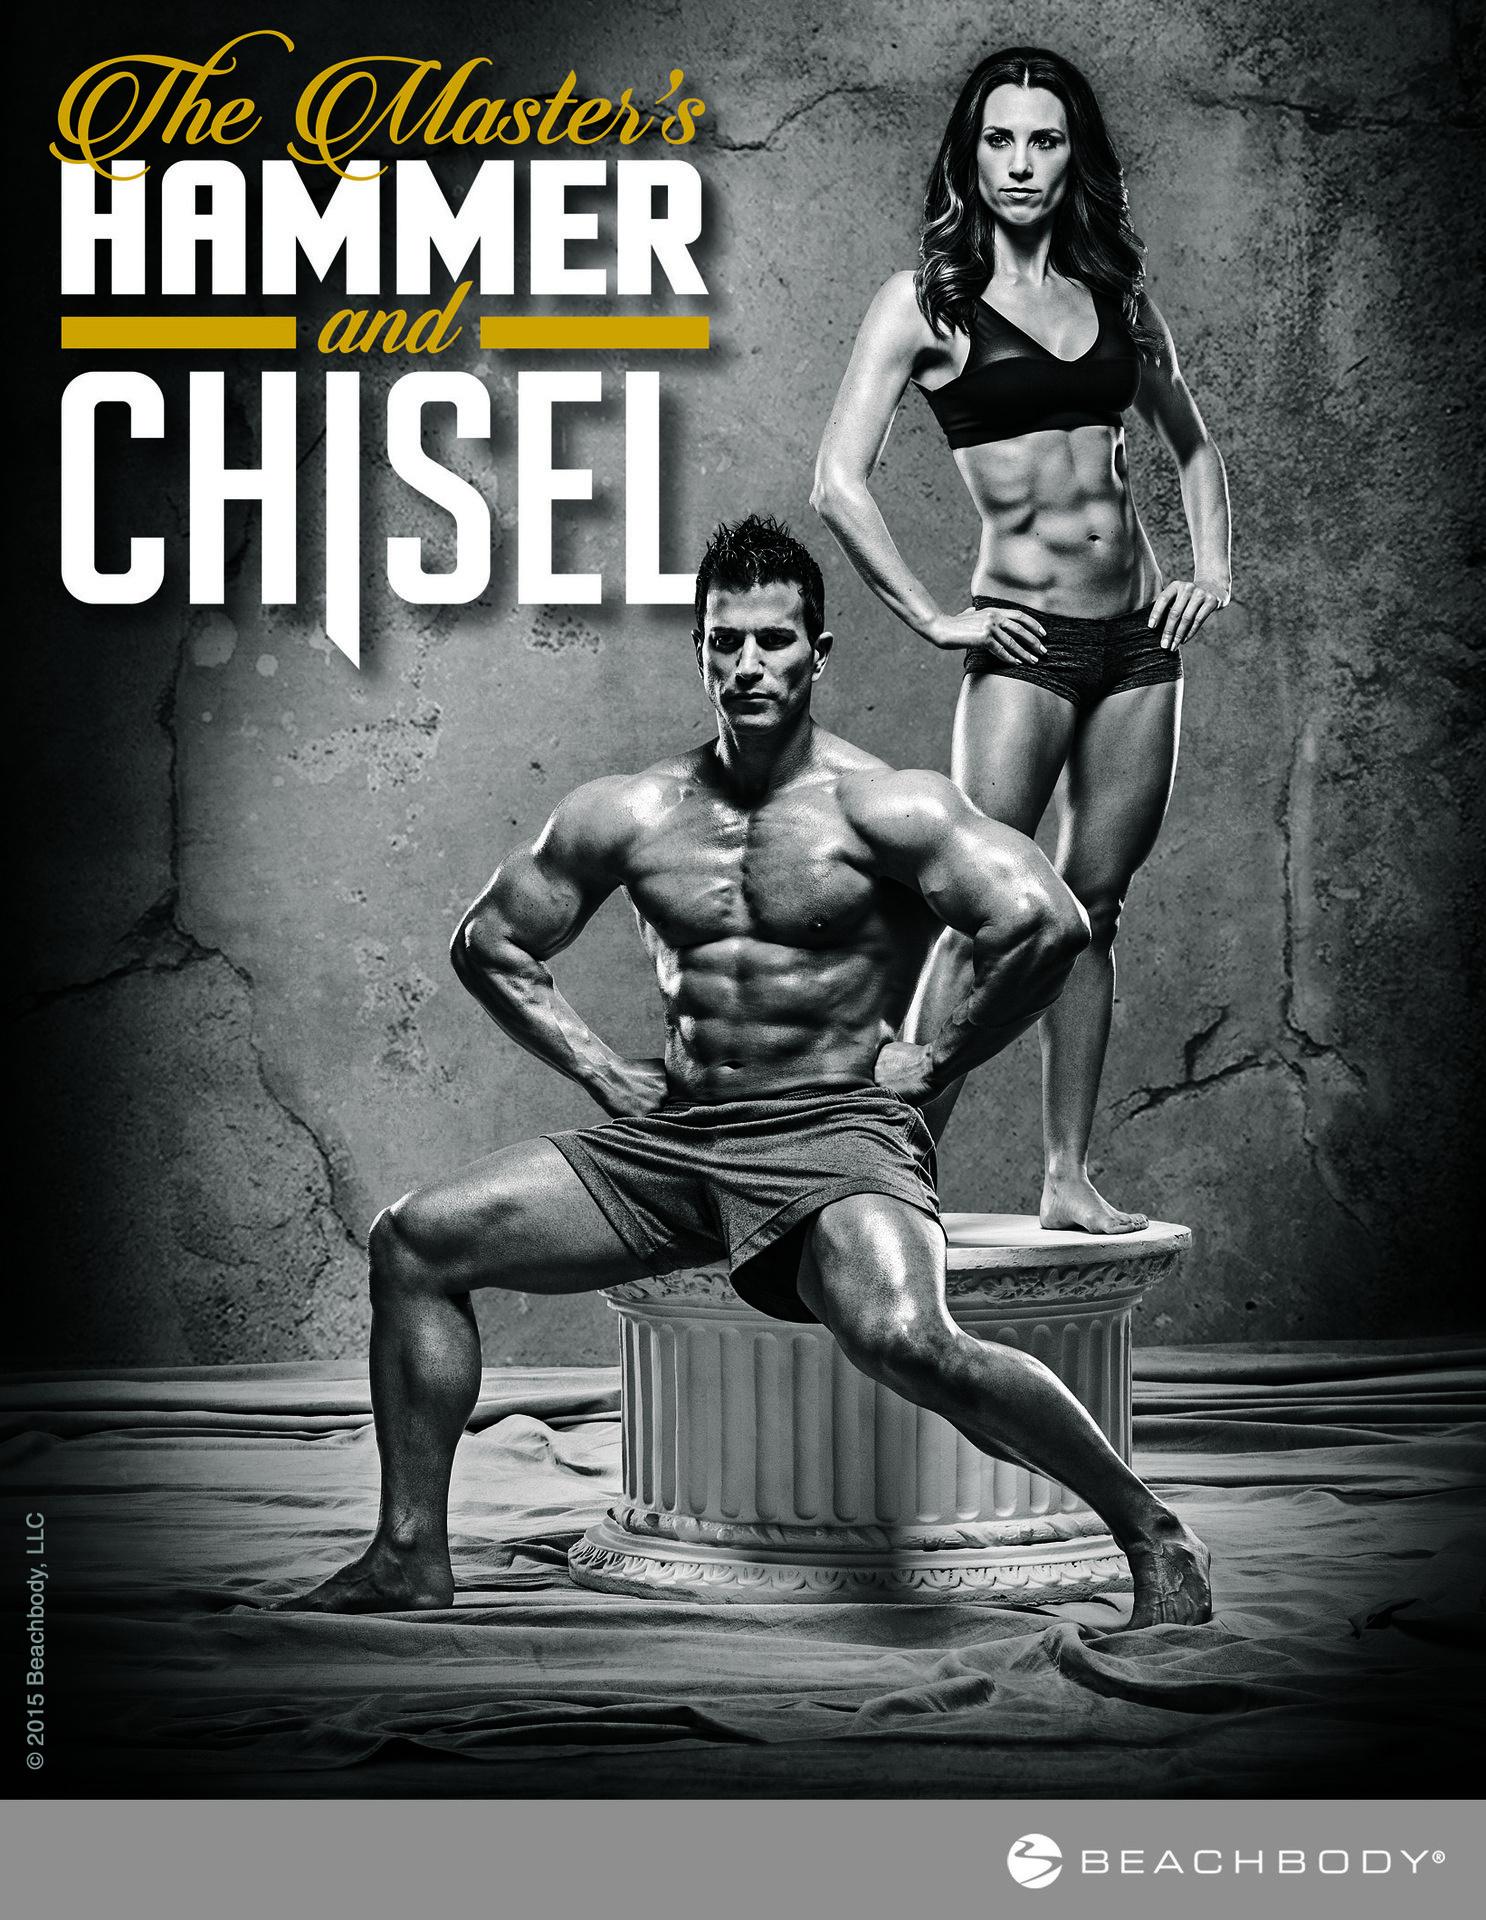 Alex_Ardenti_Sagi_Kalev_Autumn_Calabrese_hammer_and_chisel_beachbody_dvd_11